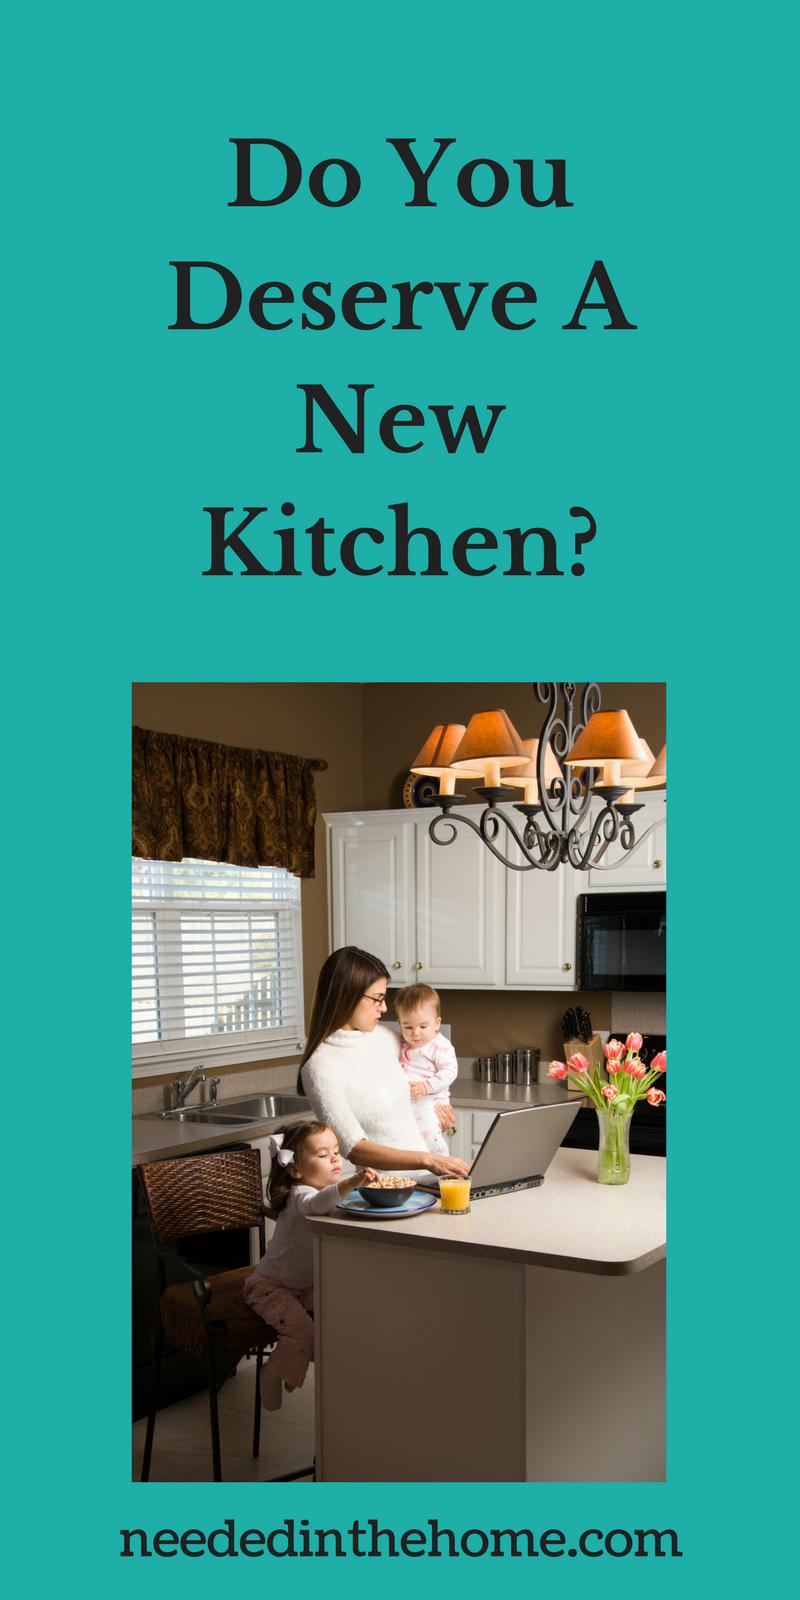 mom children laptop kitchen flowers counter lighting Do You Deserve A New Kitchen? neededinthehome.com